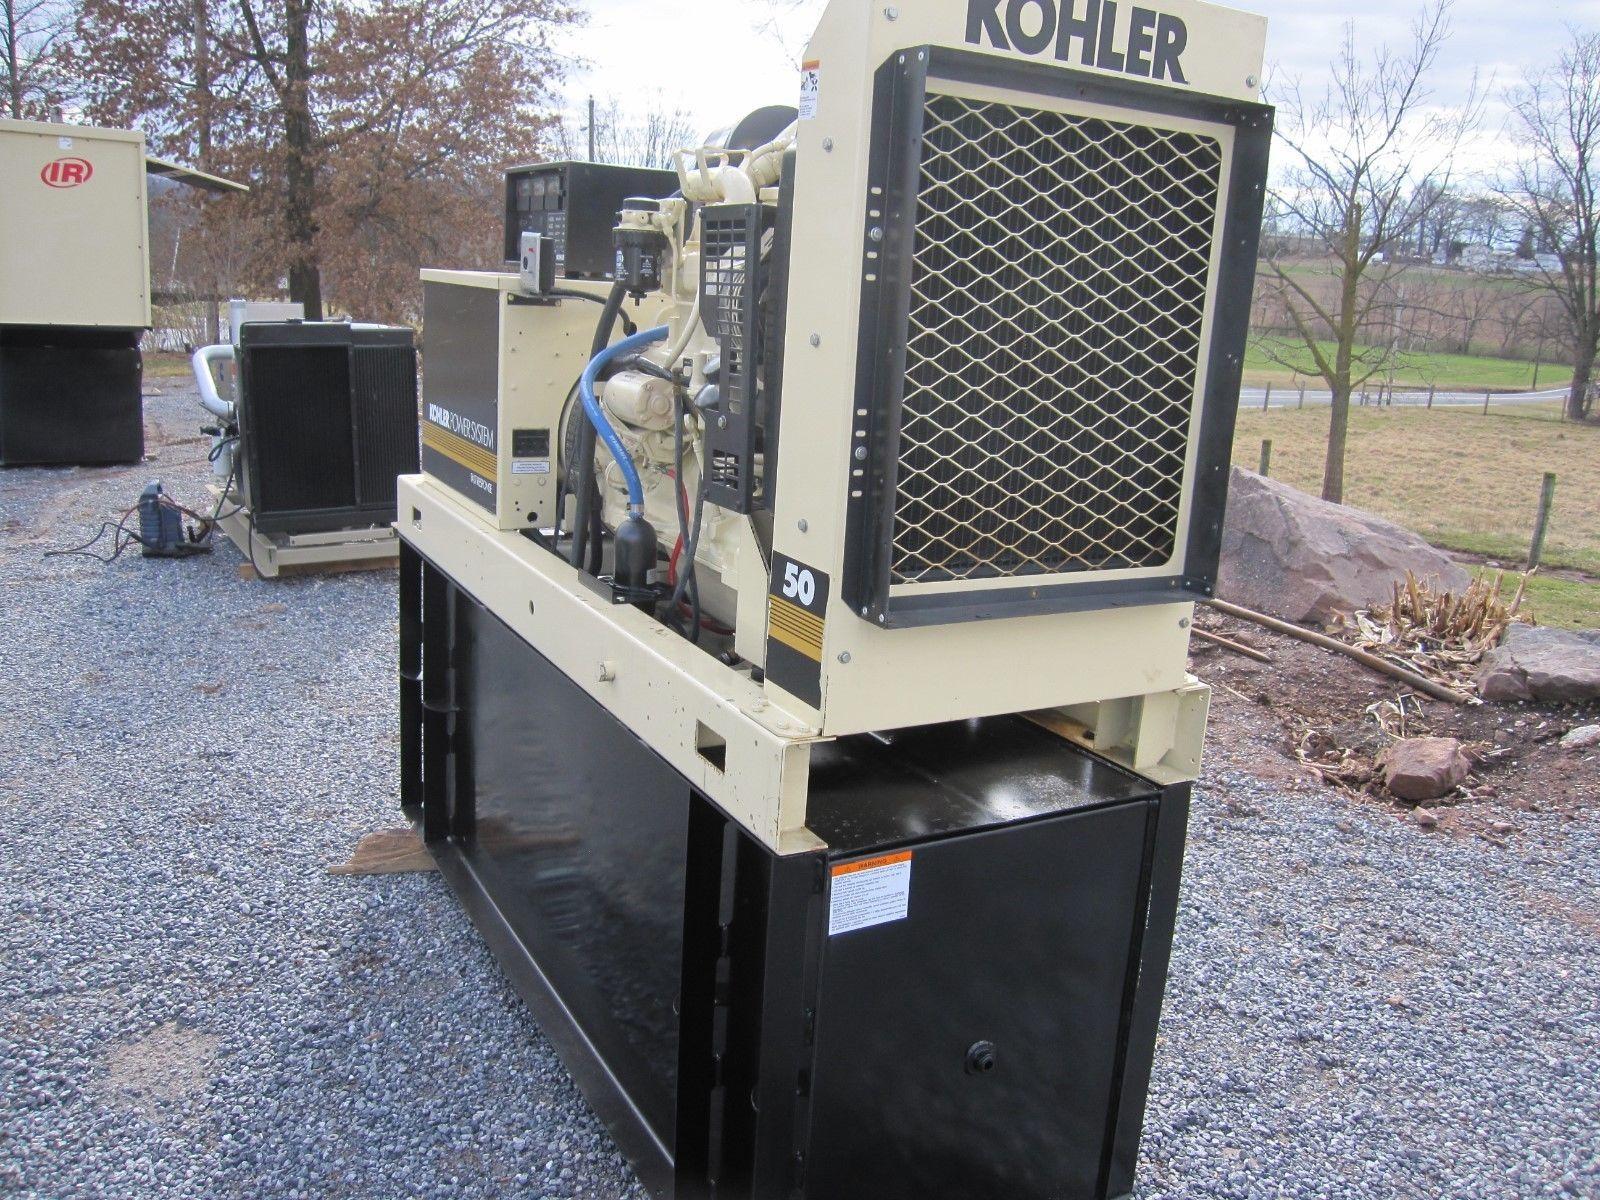 49 KW KOHLER DIESEL GENERATOR RE FURBISHED ON BOARD FUEL TANK LOW